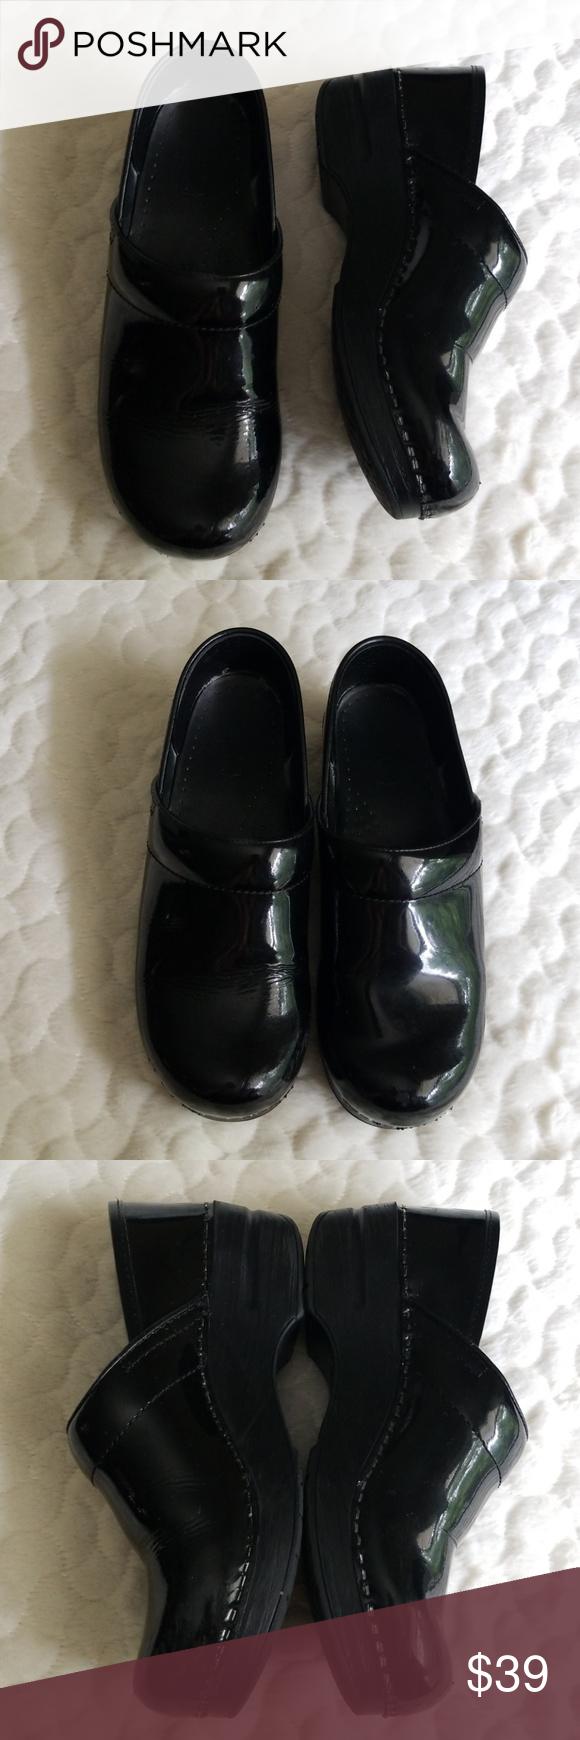 Dansko clogs shiny black nurse shoes